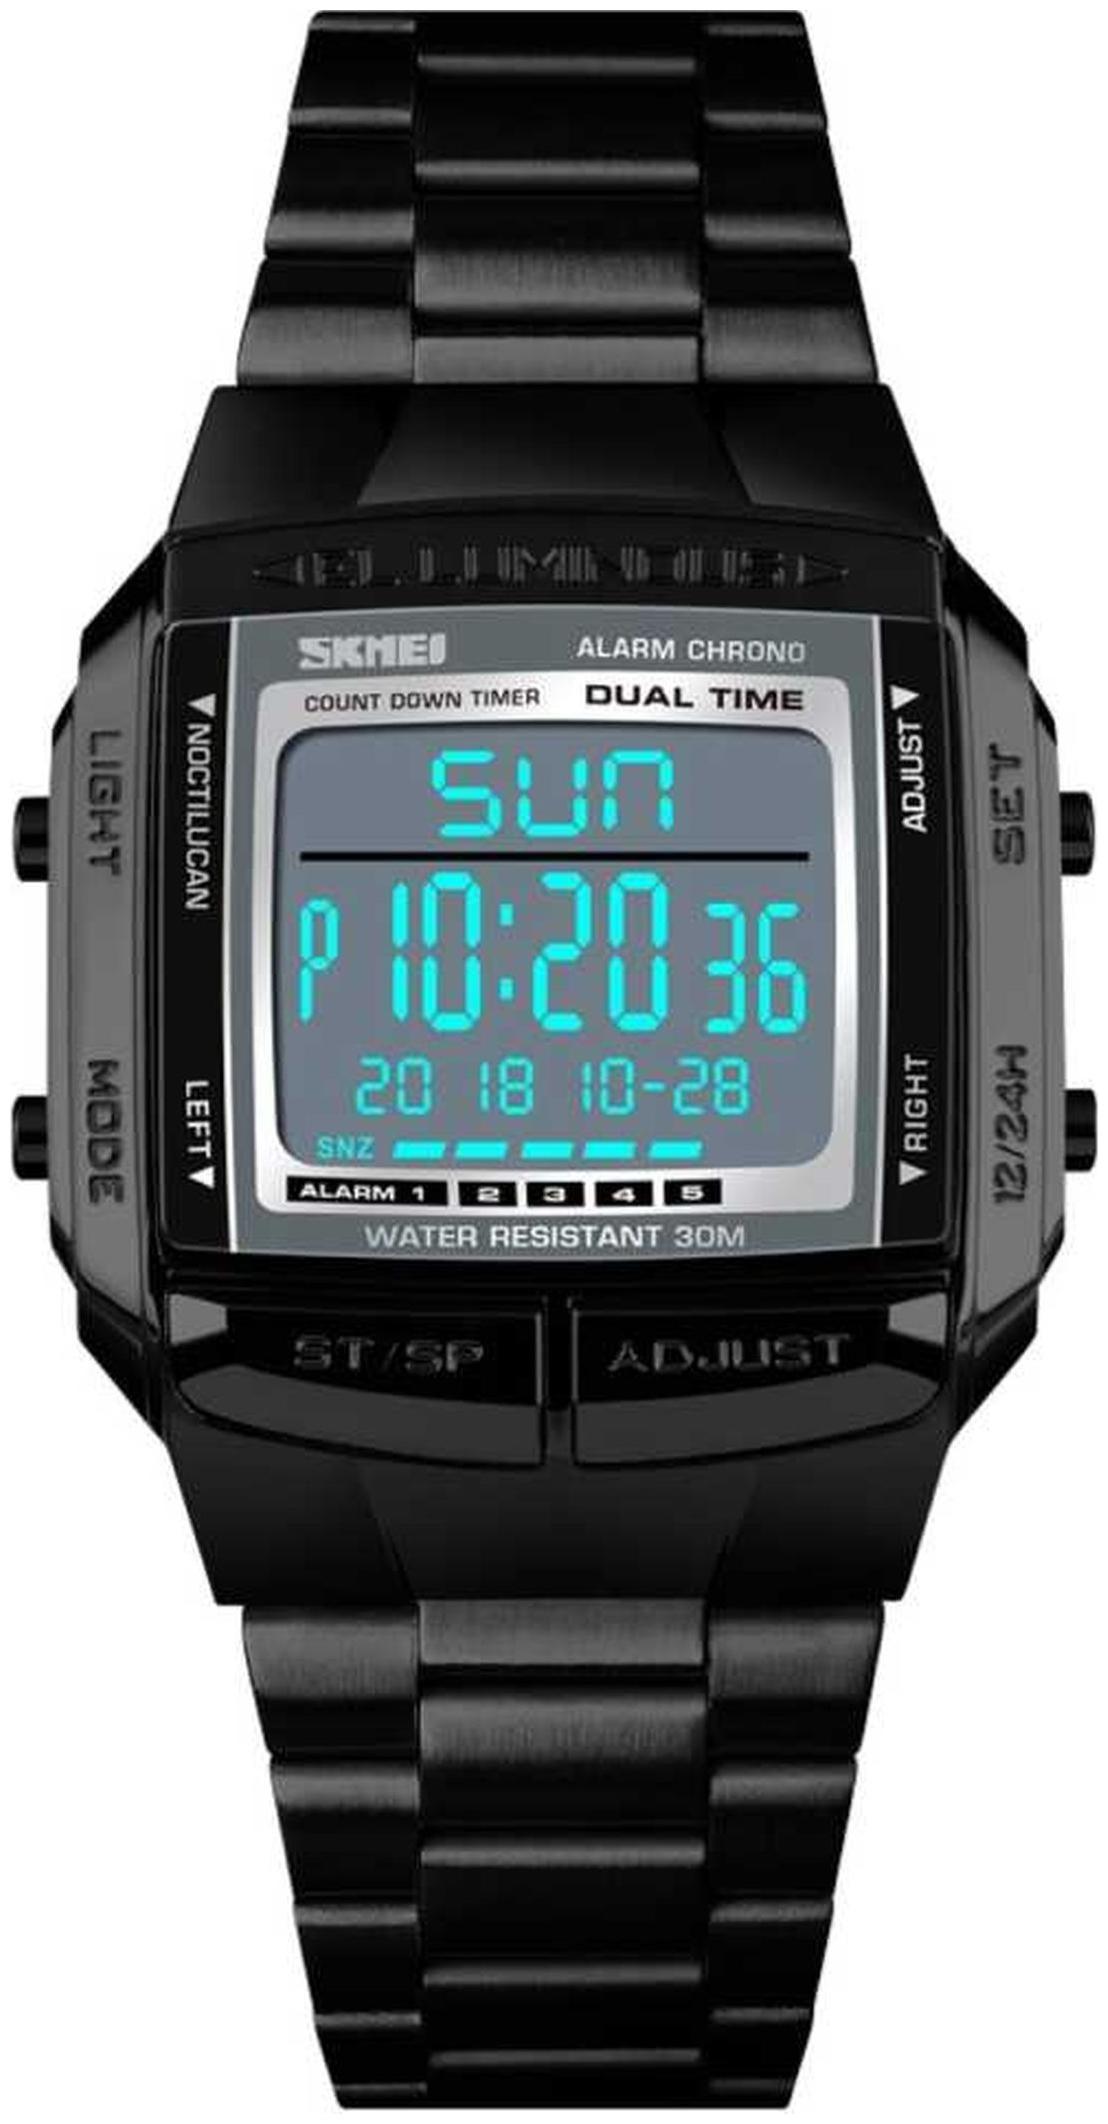 Skmei Luxury Brand Sports Watches 5 Alarm Dusk Countdown Electronic Digital Wrist Watch Fashion Outdoor Clock Men by Anam Ecommerce